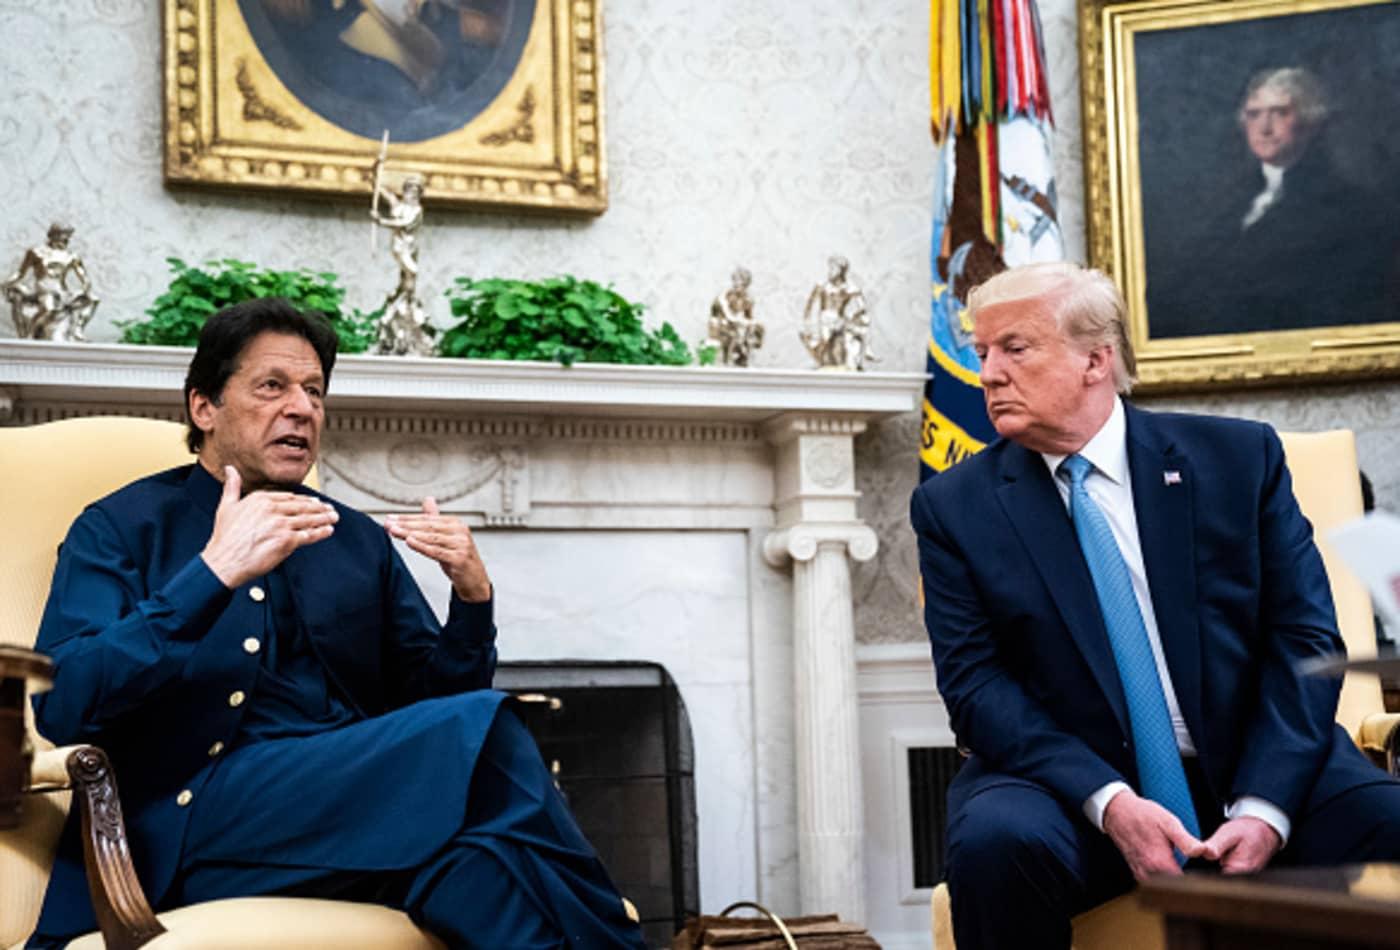 Pakistan Prime Minister Imran Khan again calls for Trump to mediate on Kashmir dispute